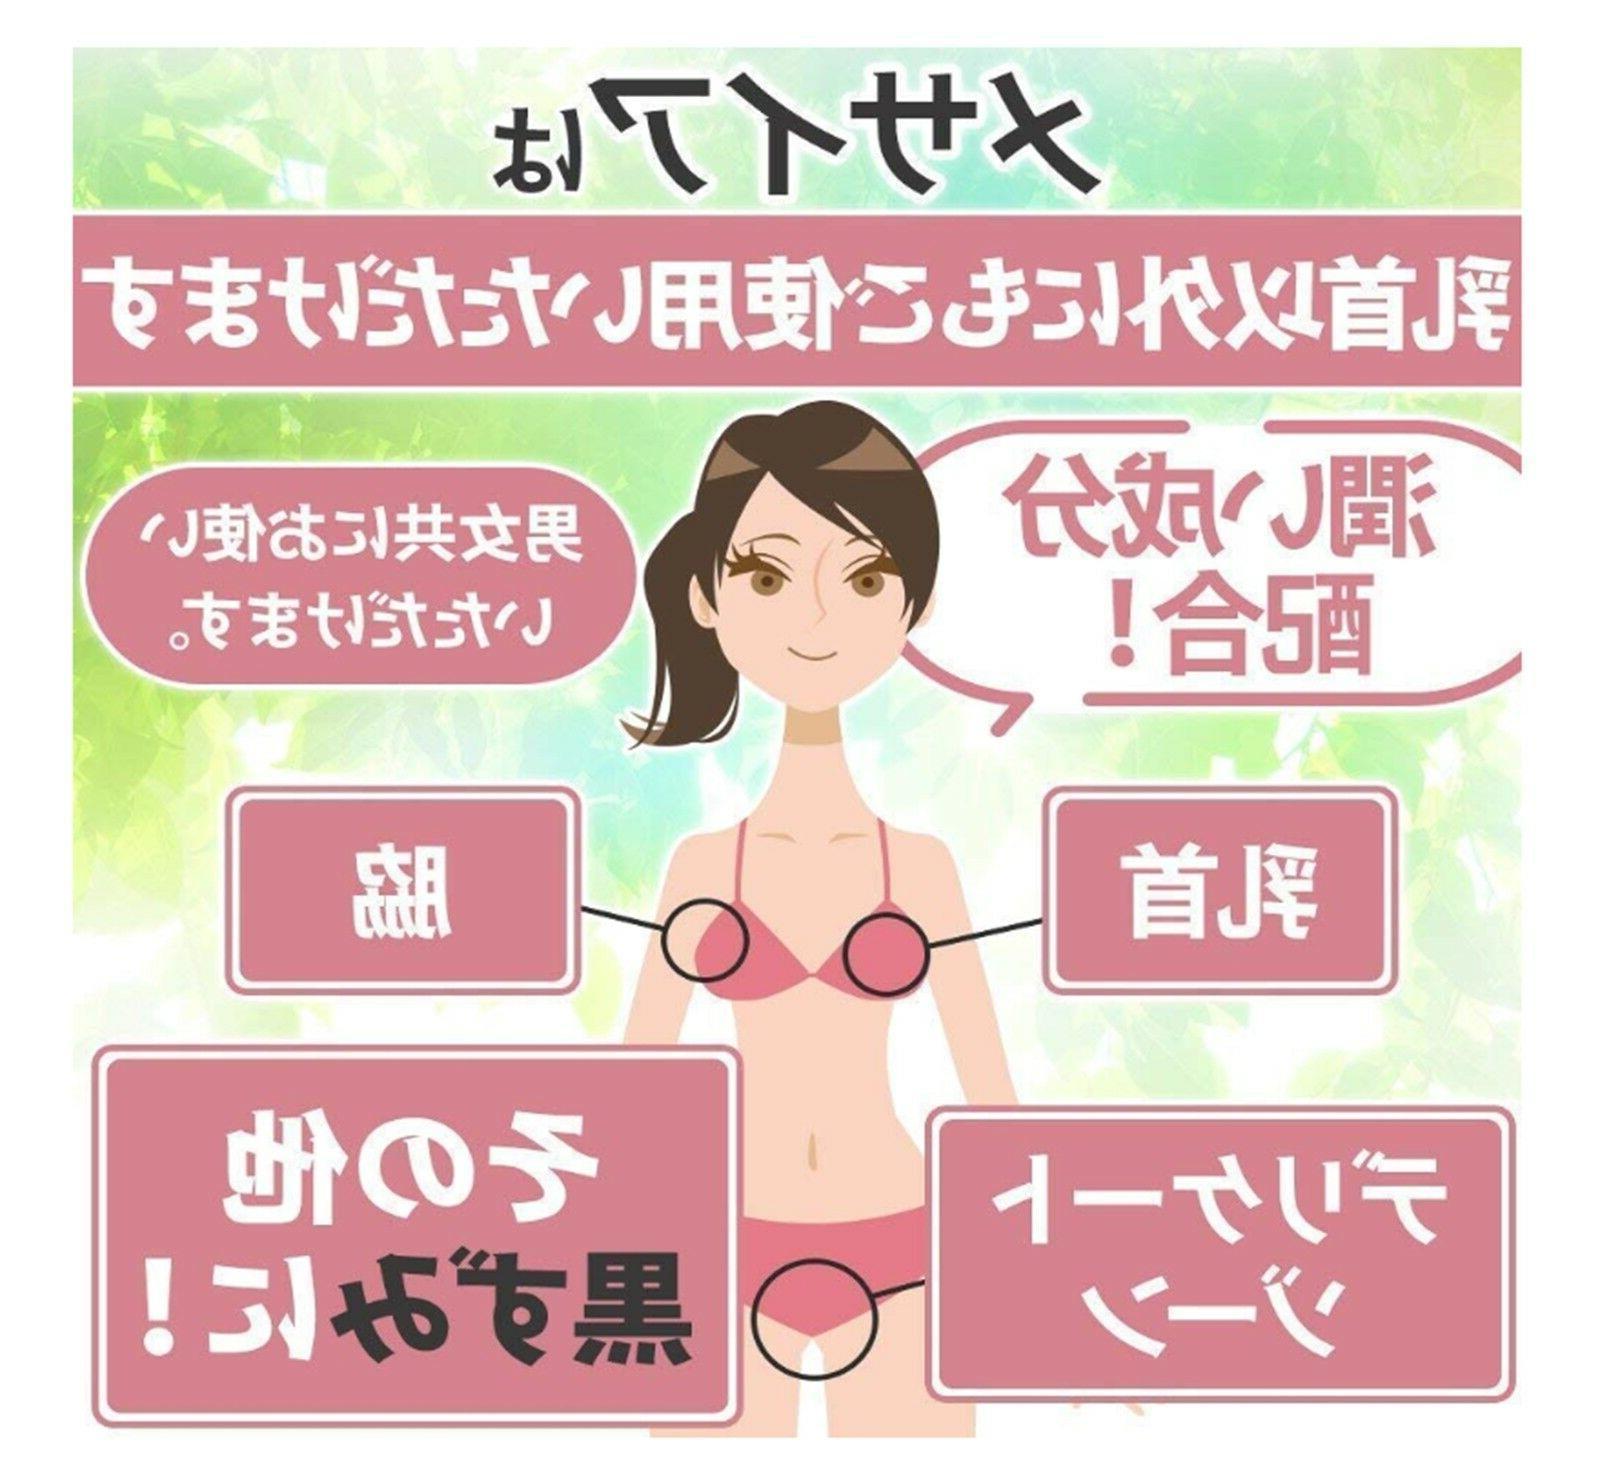 Messiah body cream X nipple skin